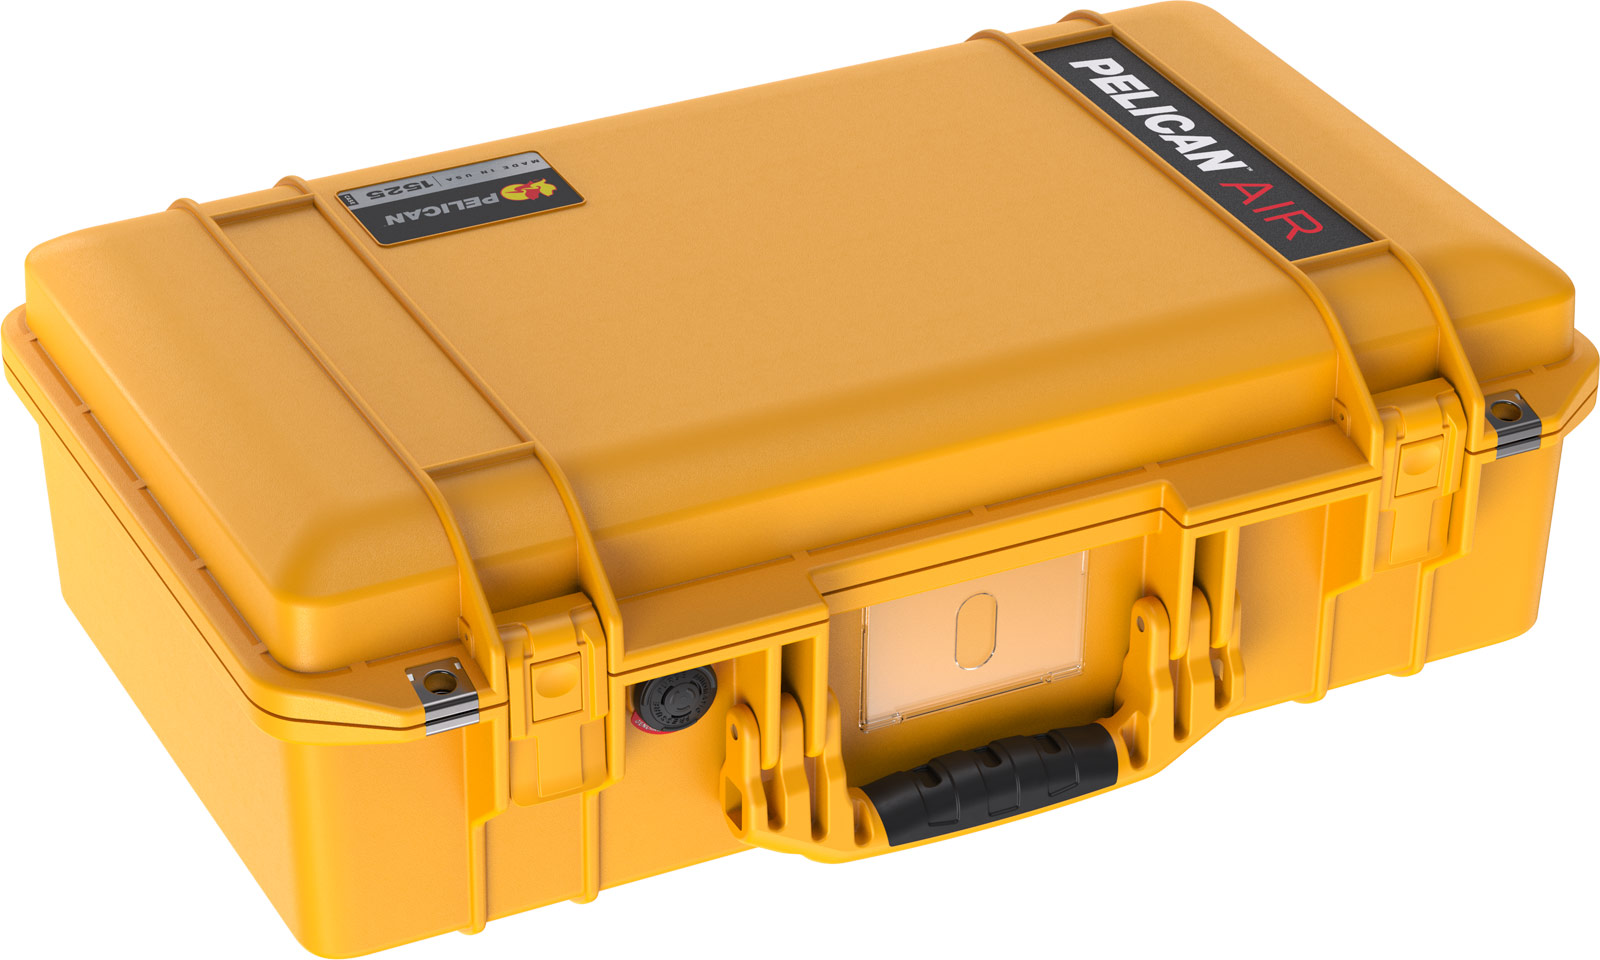 pelican yellow camera case air hard cases